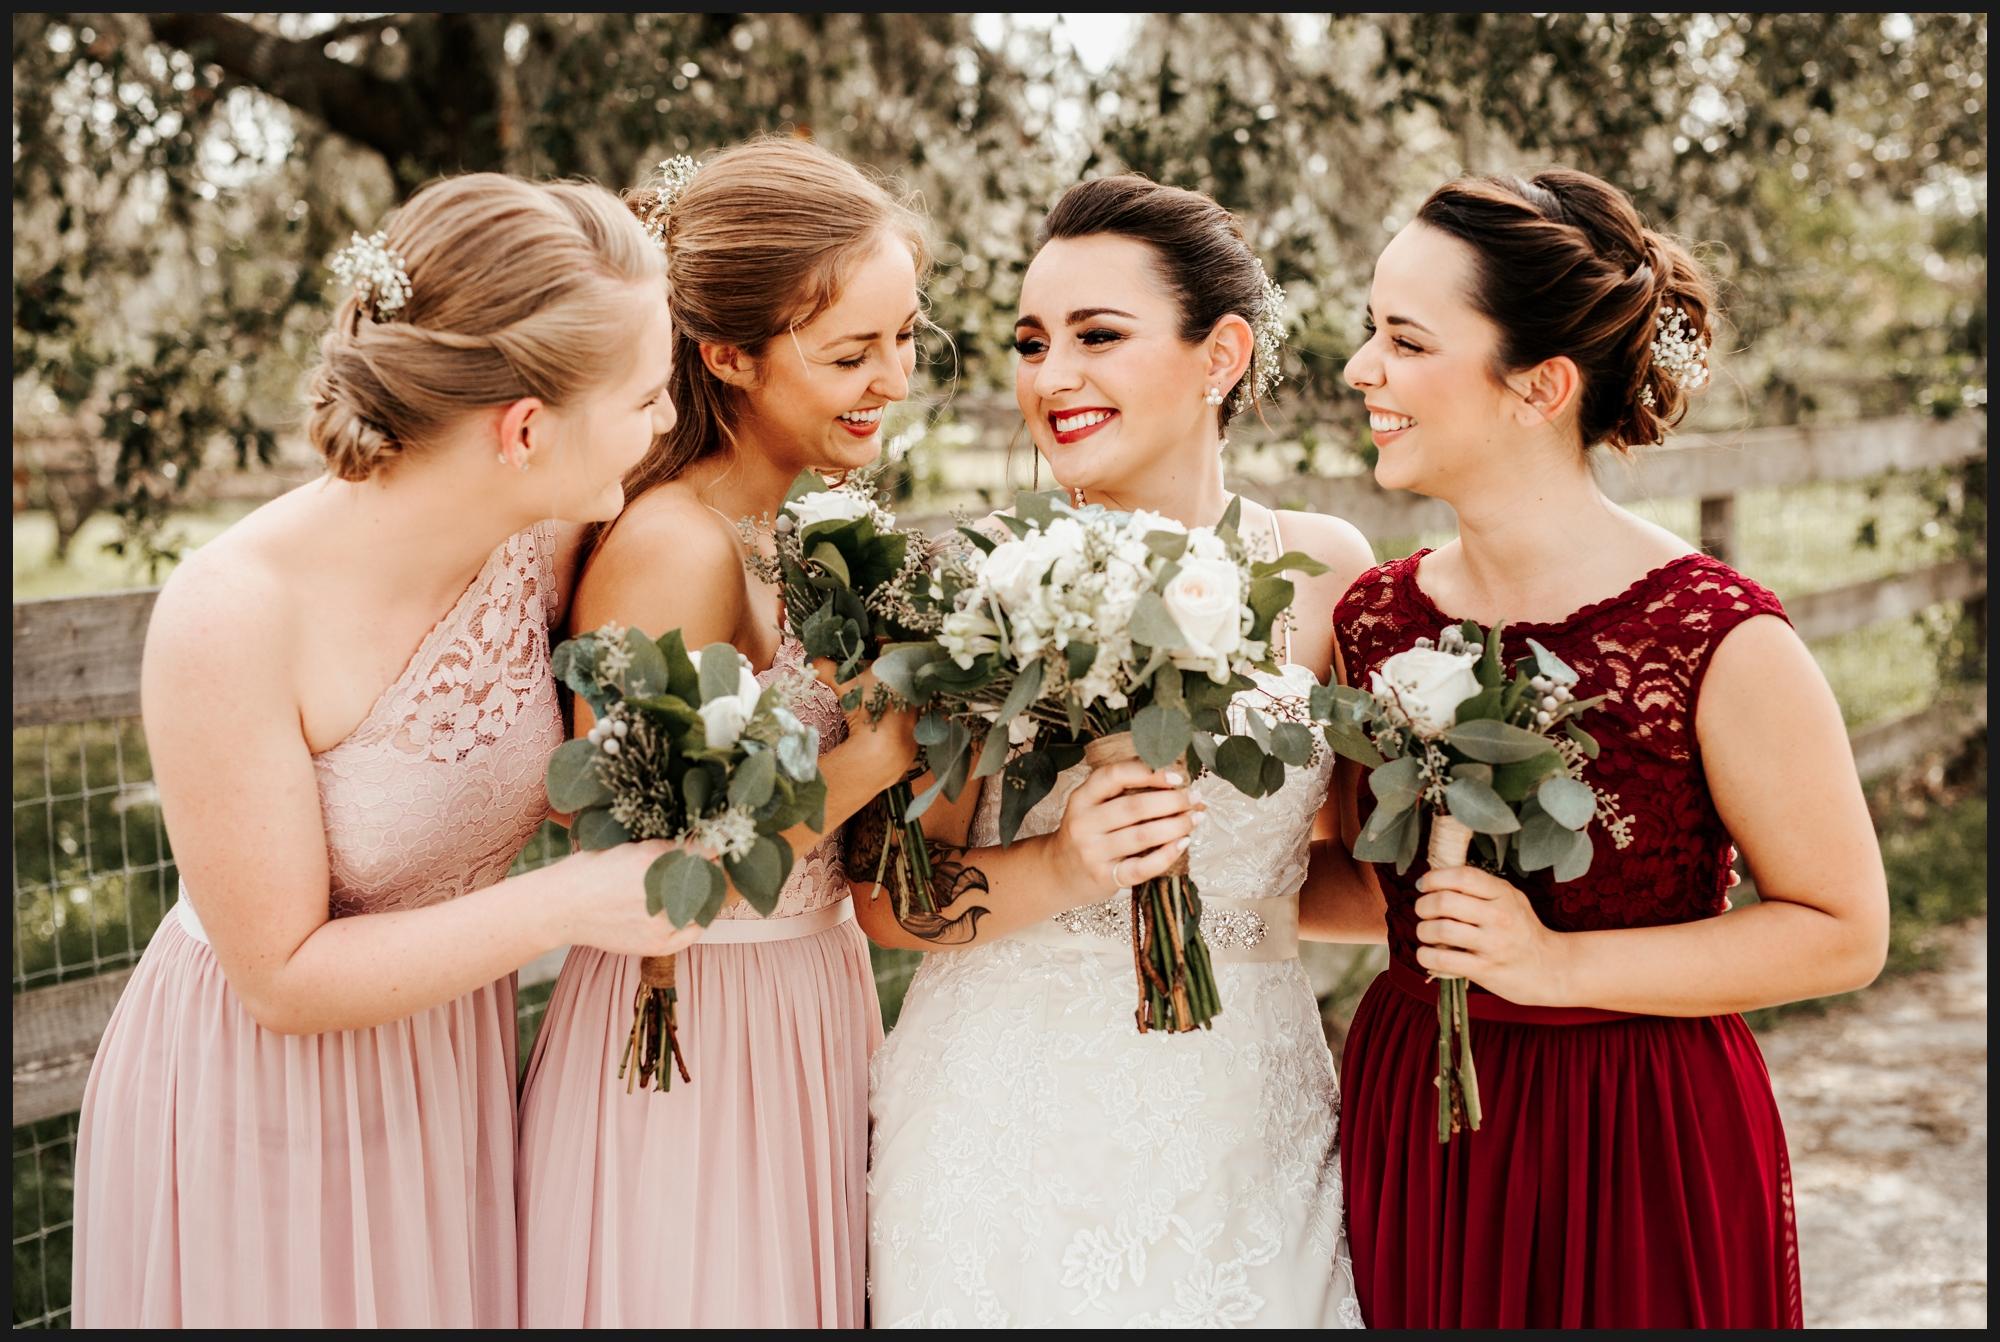 Orlando-Wedding-Photographer-destination-wedding-photographer-florida-wedding-photographer-bohemian-wedding-photographer_0318.jpg